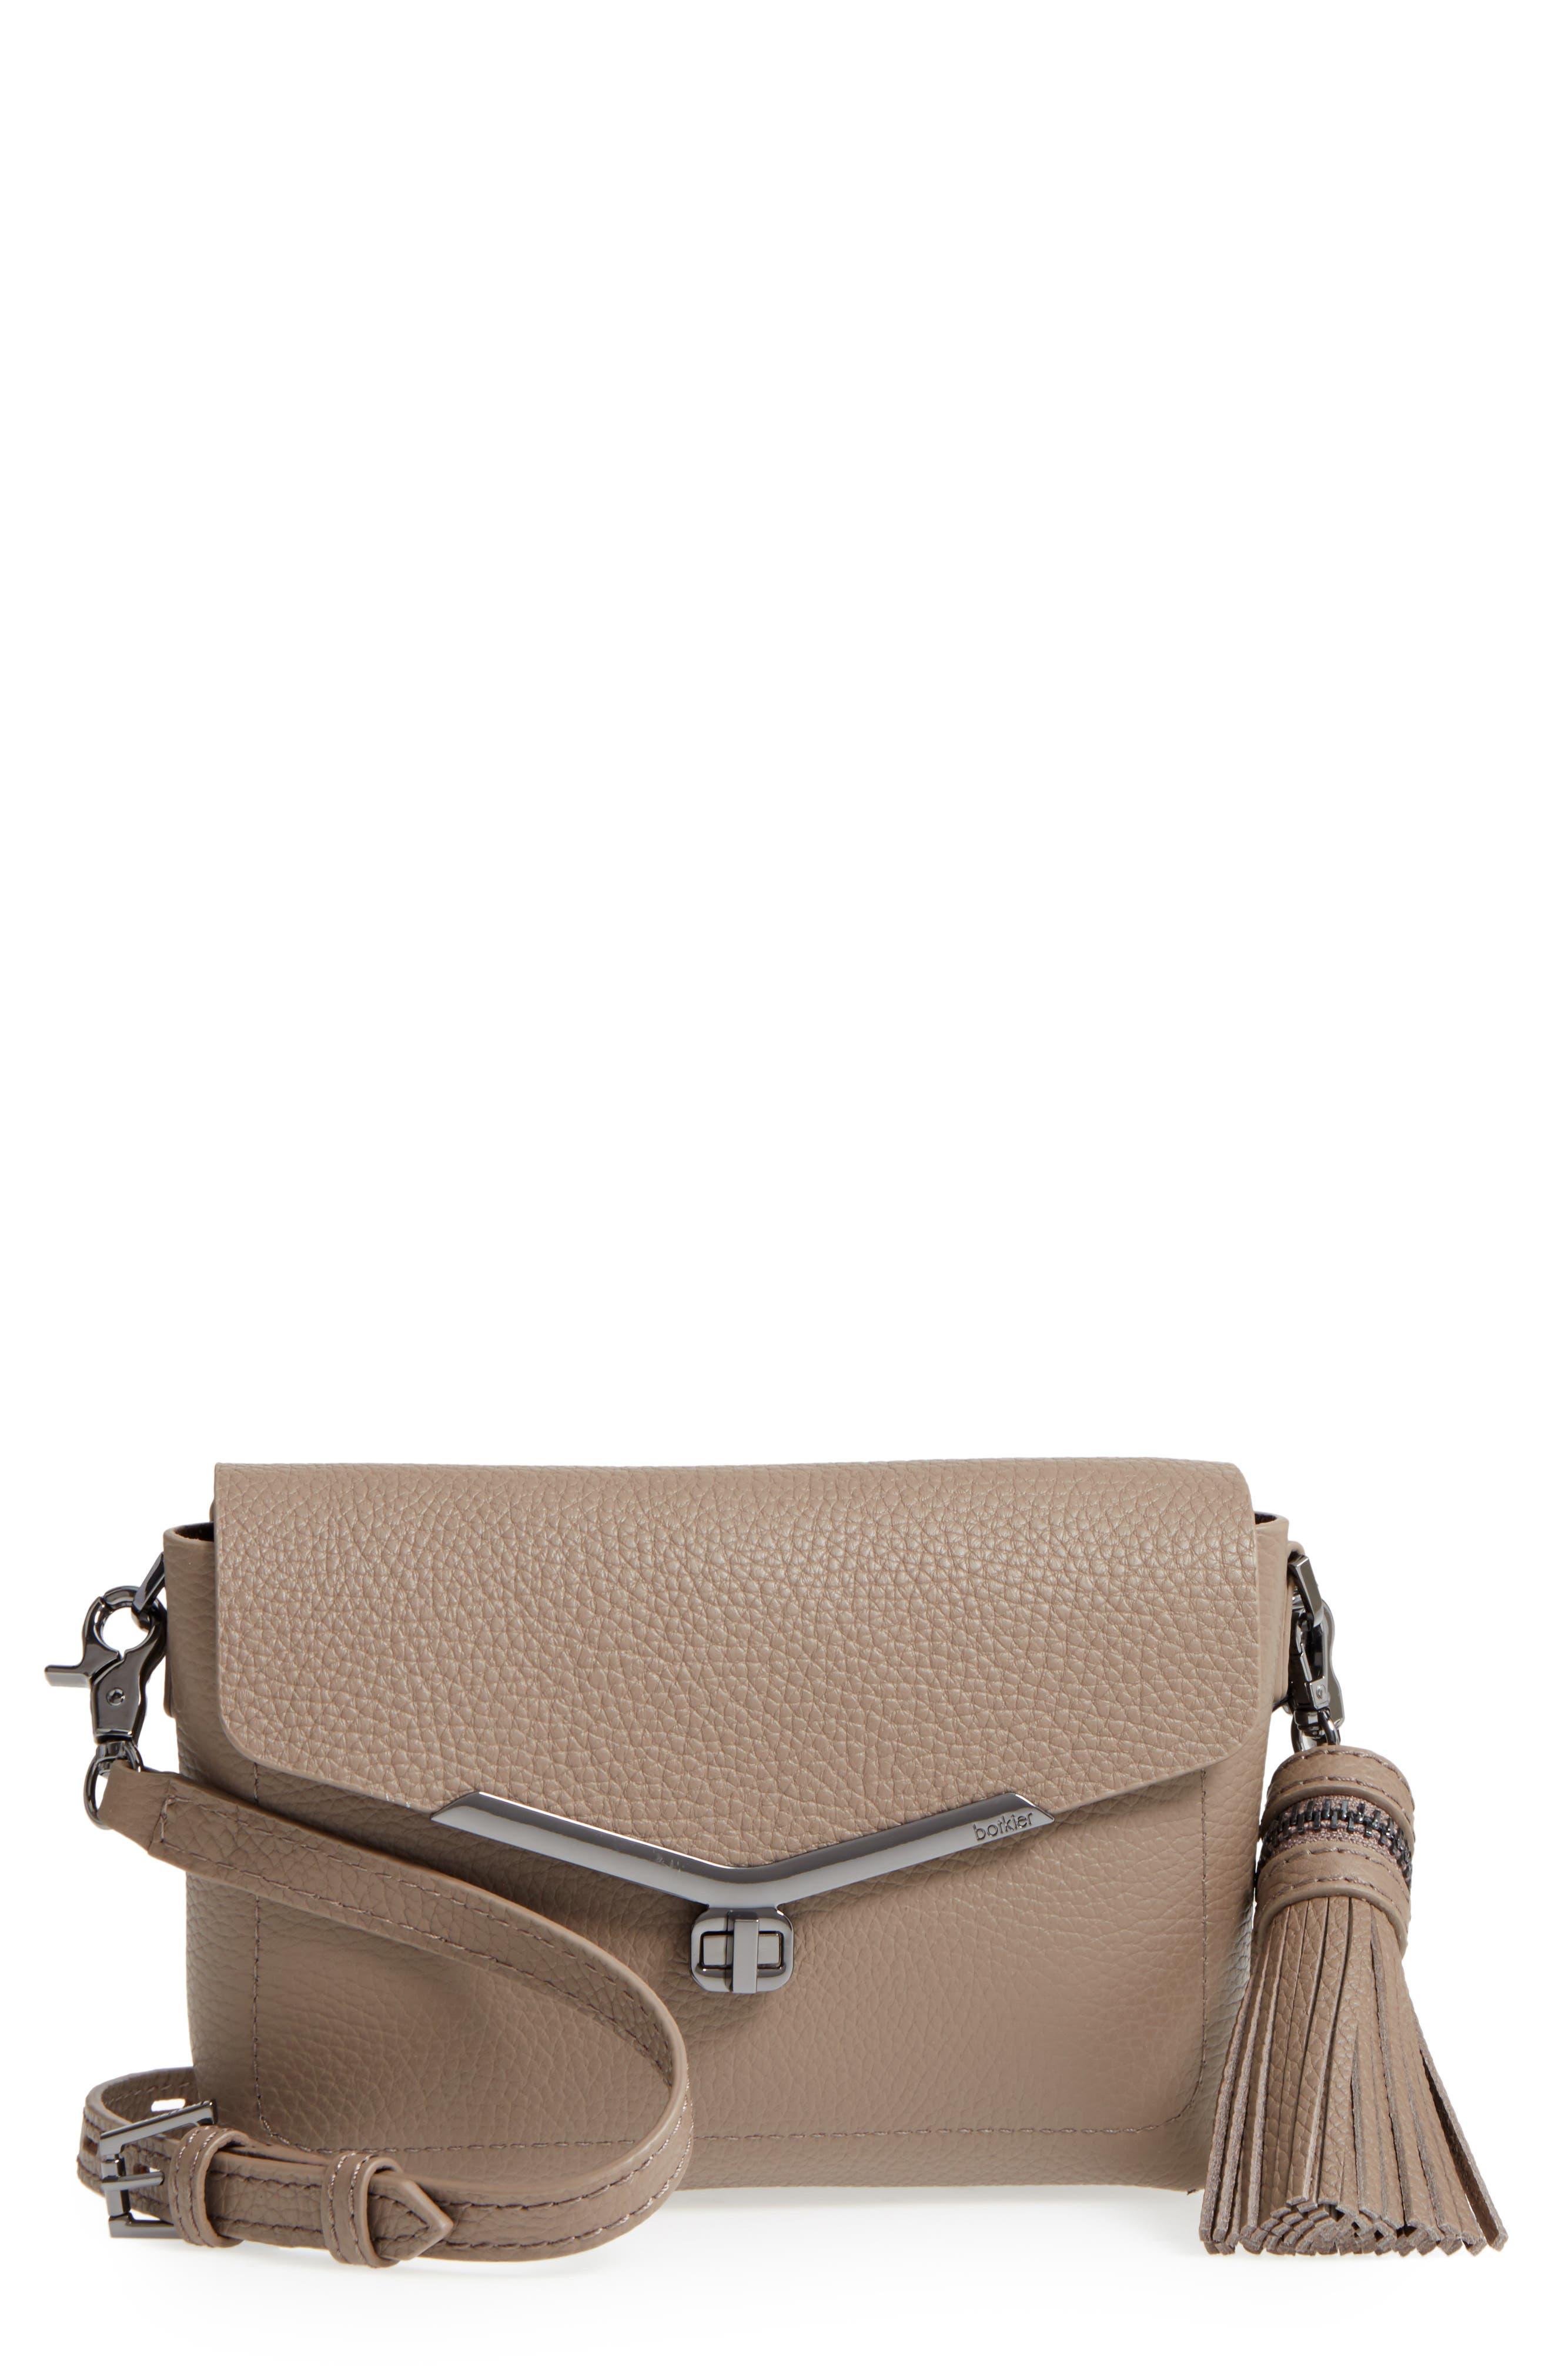 Alternate Image 1 Selected - Botkier Vivi Leather Crossbody Bag